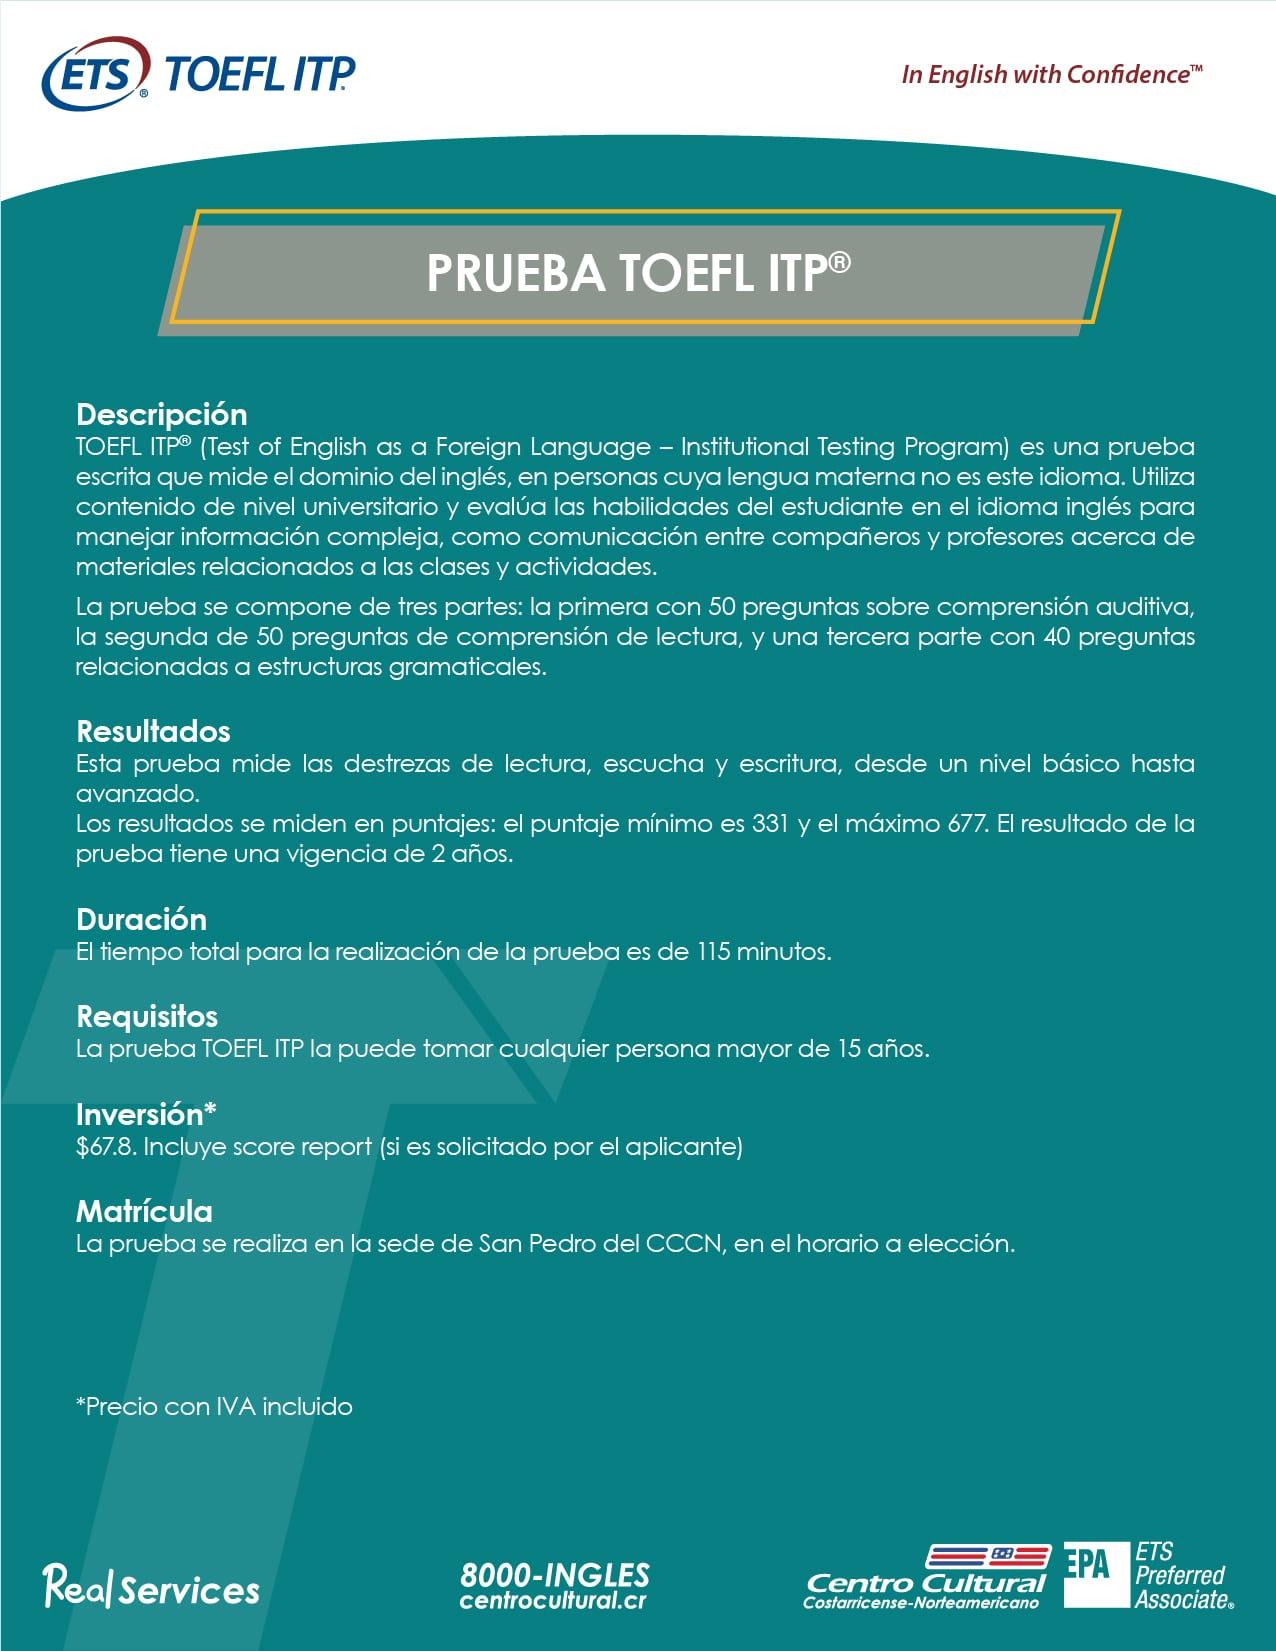 FICHA PRUEBA TOEFL ITP